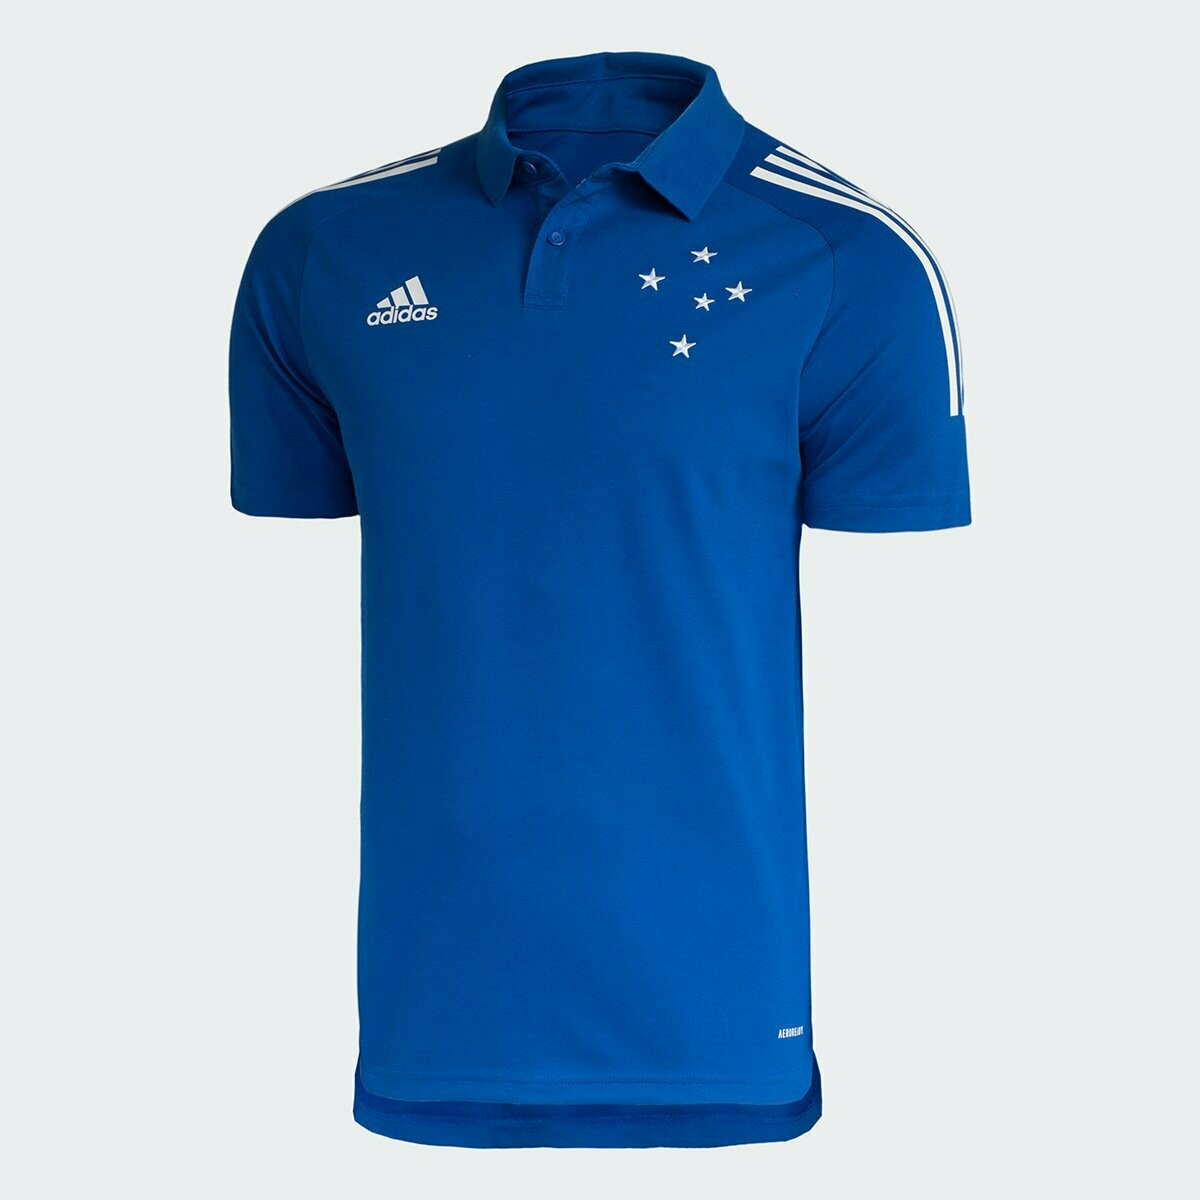 Camisa Polo Cruzeiro Viagem 20/21 Adidas Masculina - Azul Royal